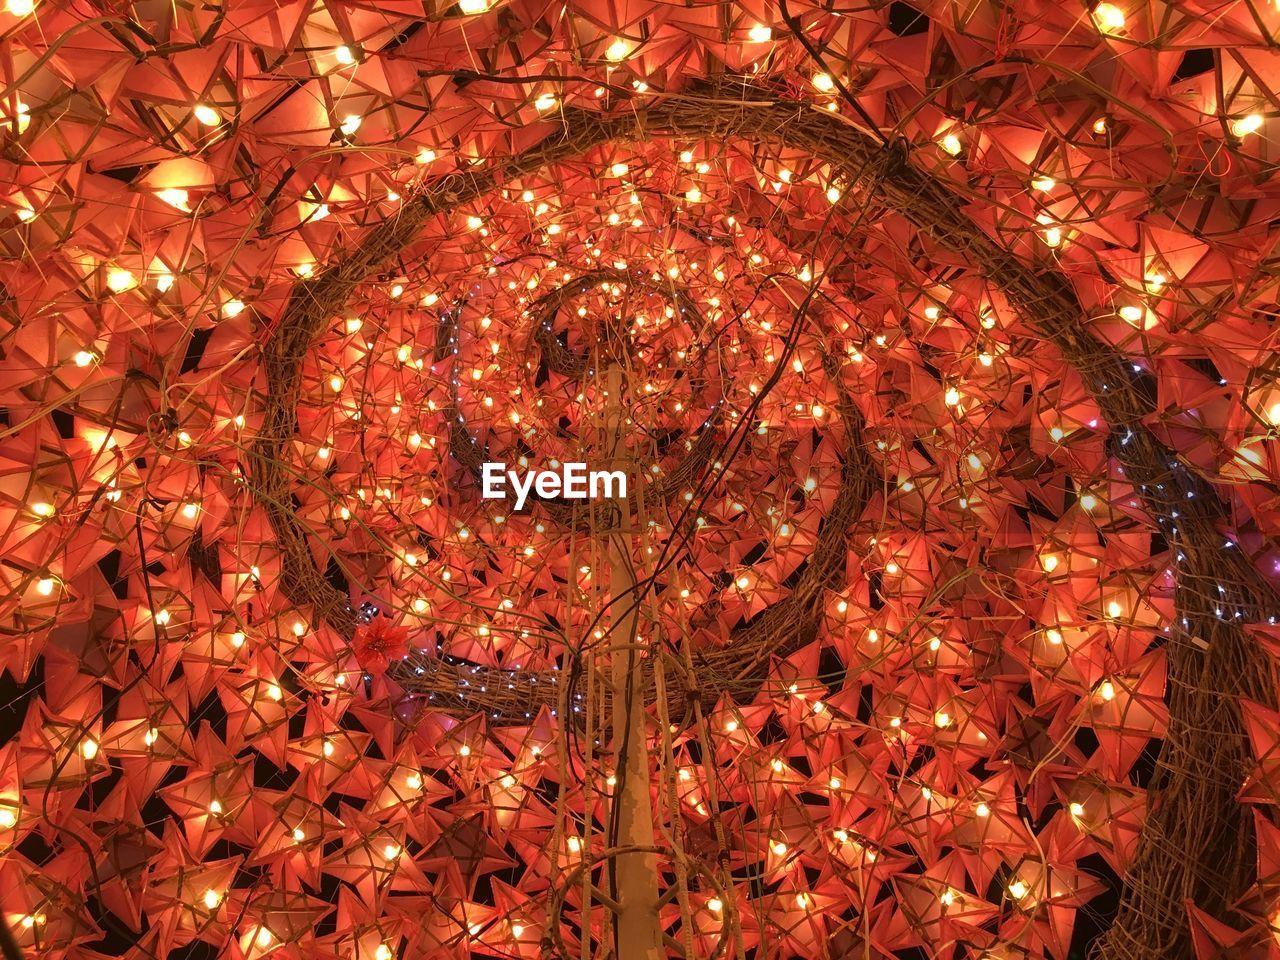 LOW ANGLE VIEW OF ILLUMINATED LANTERNS HANGING ON CHRISTMAS LIGHTS